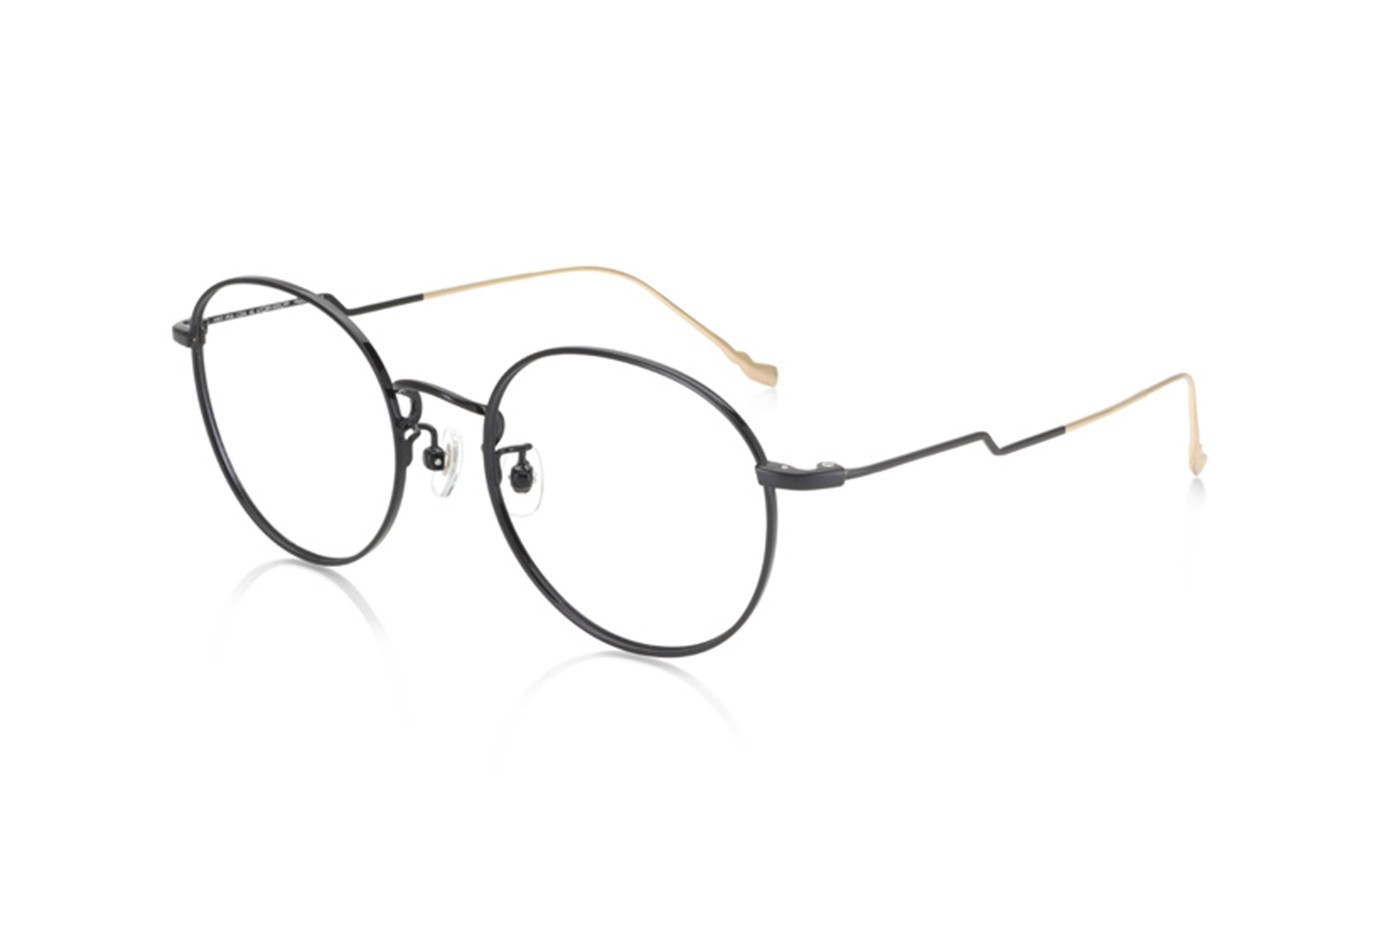 JINS推出52件神奇宝贝眼镜系列